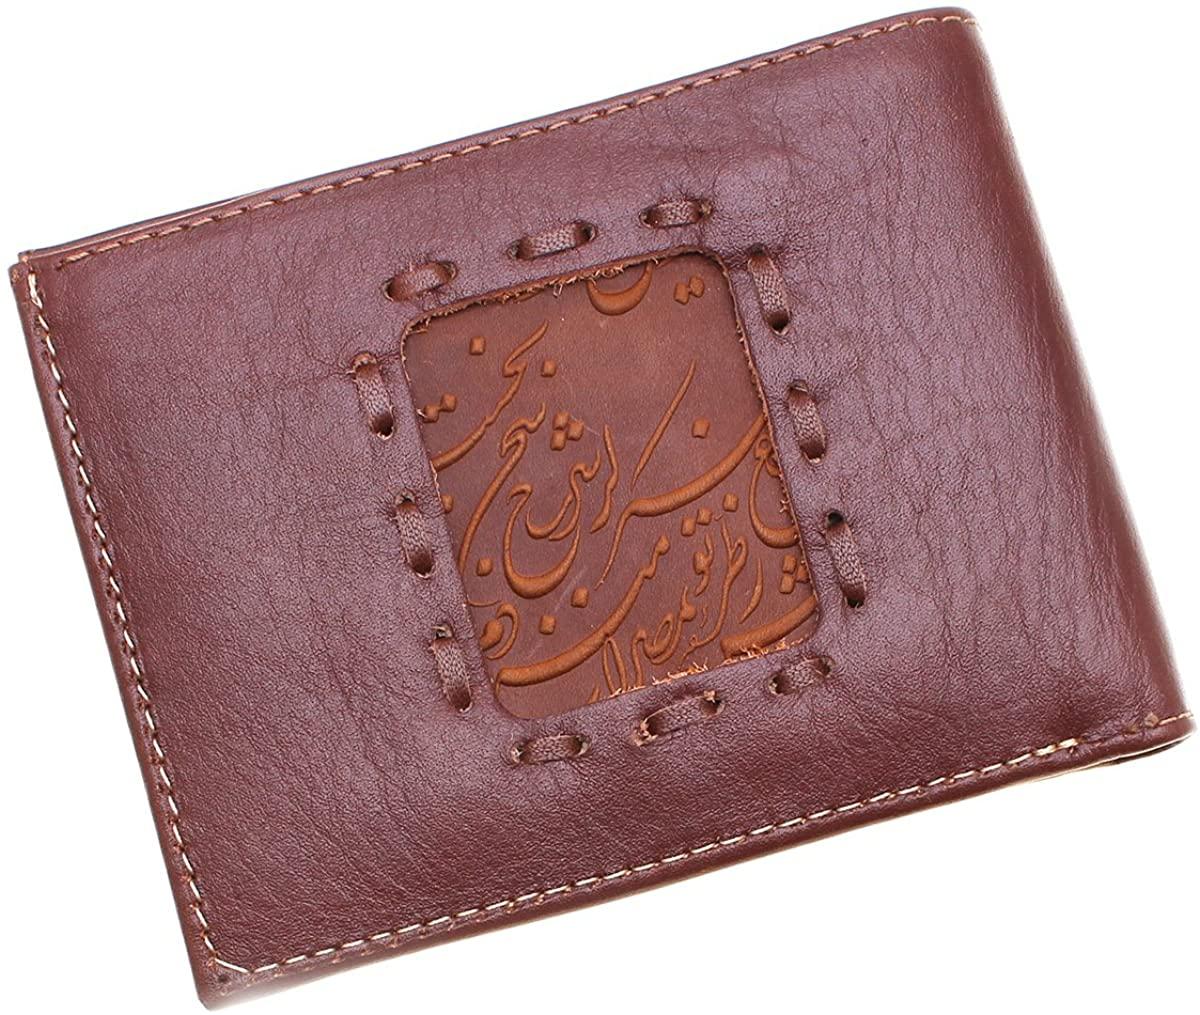 Asoodehdelan Genuine Leather Persian Parsi Poetry Men Wallet Persia Art Gift